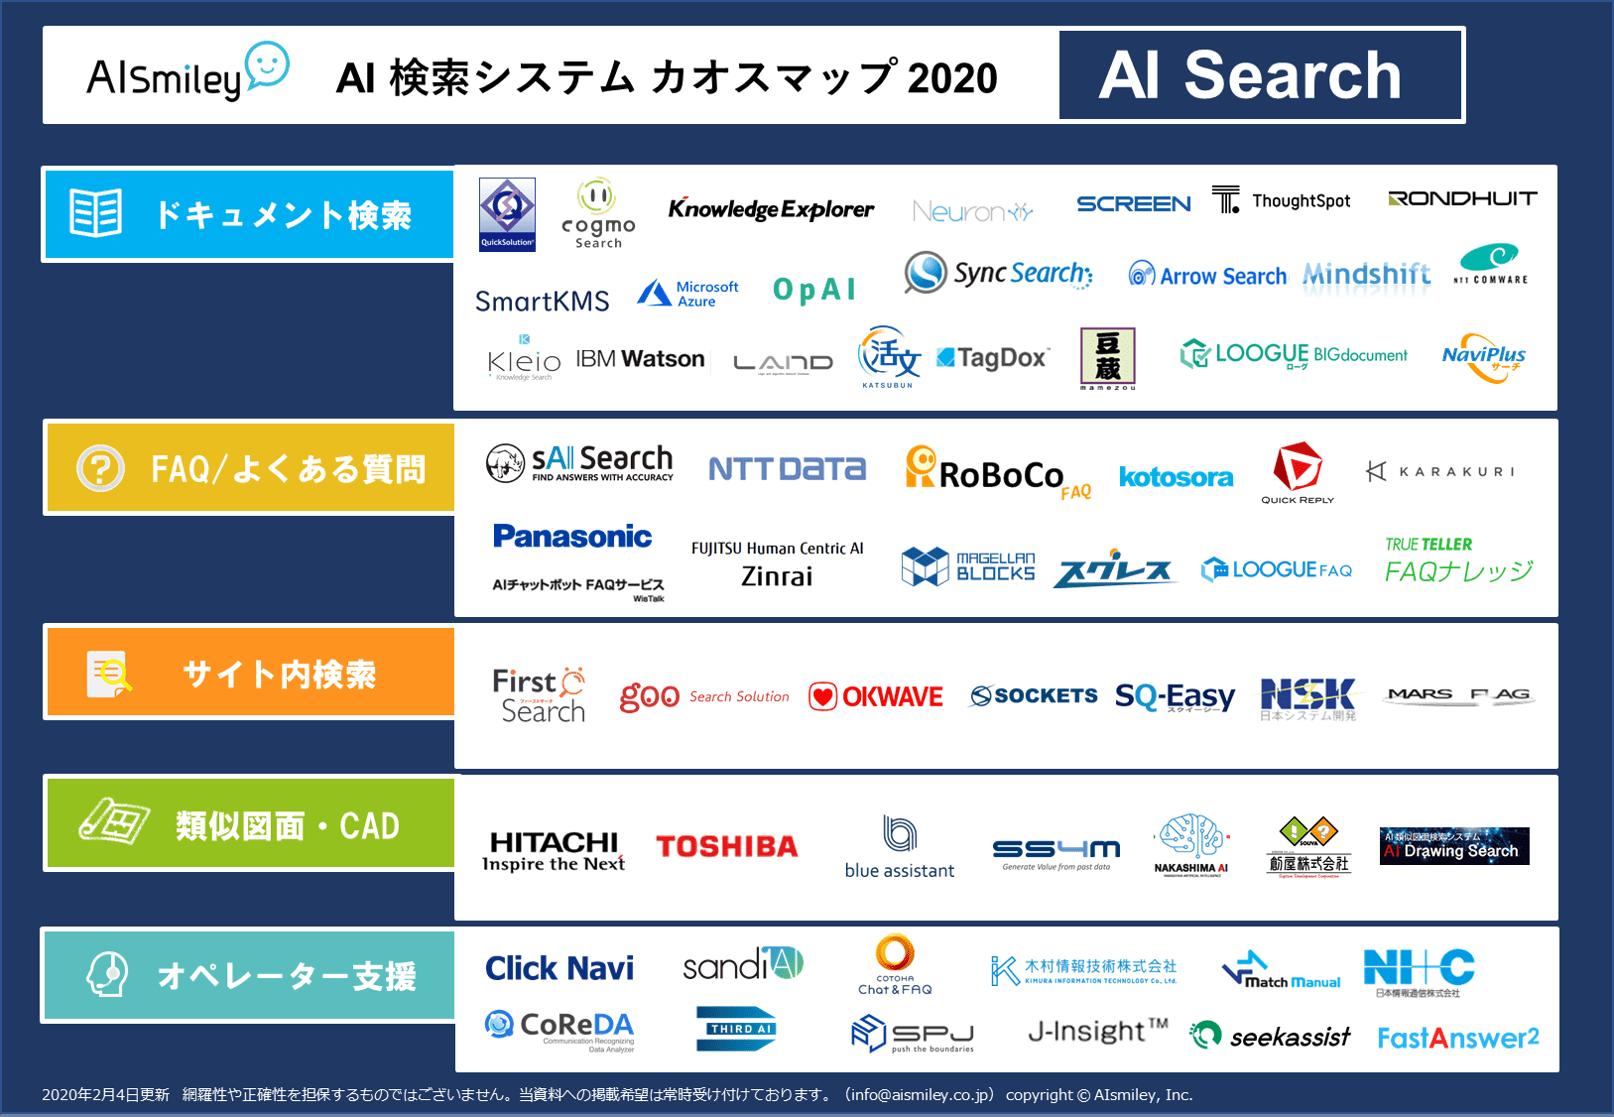 AI検索システム カオスマップ 2020 を公開